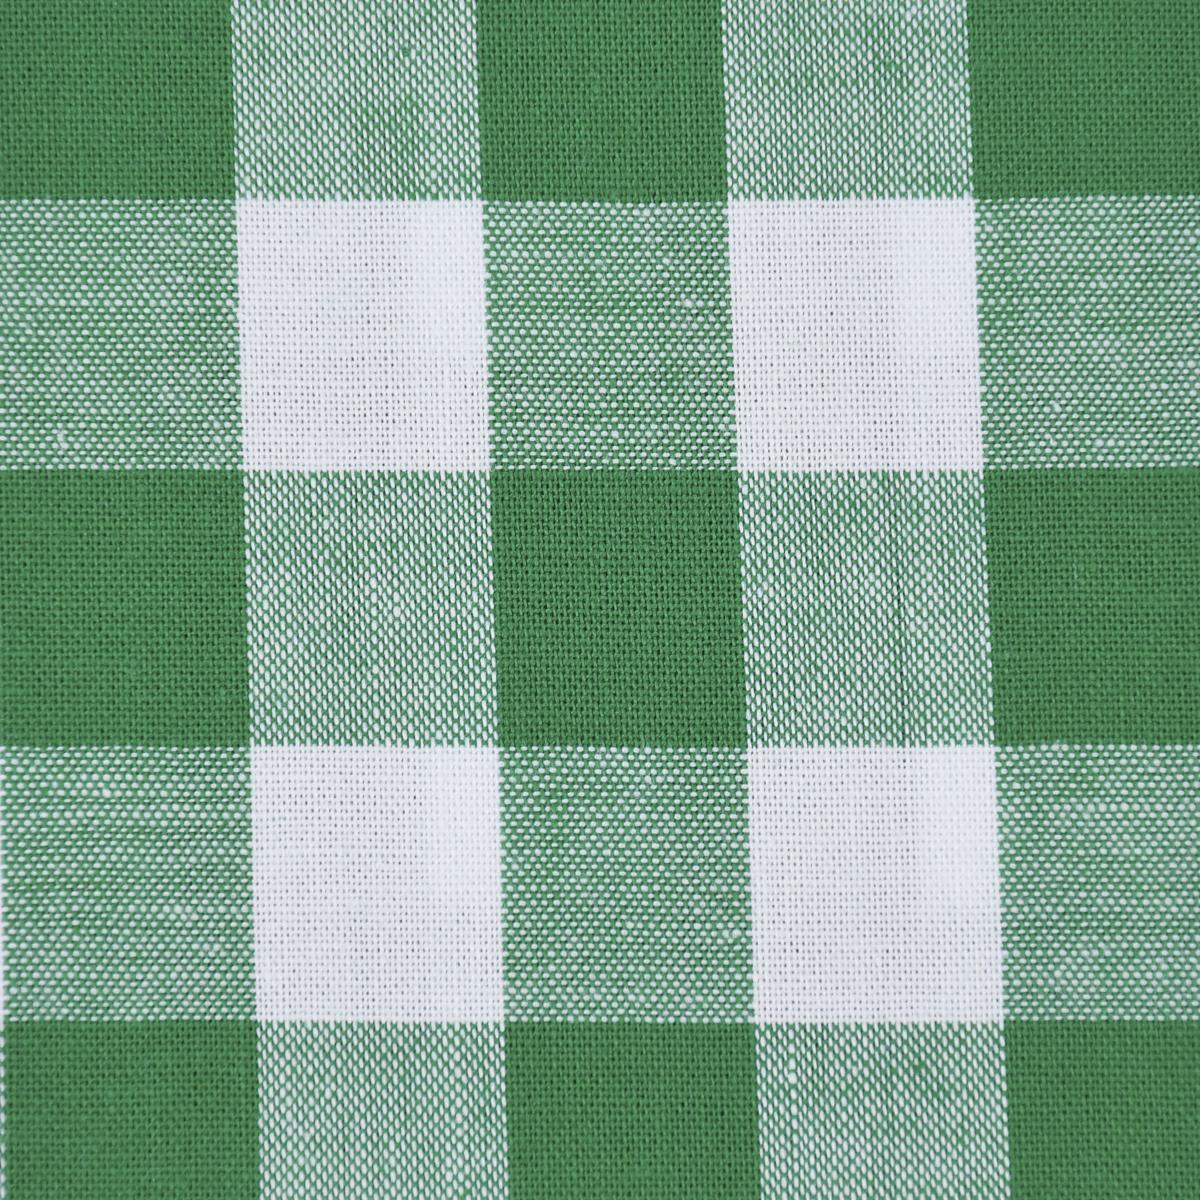 Baumwollstoff kariert weiß grasgrün 16mm